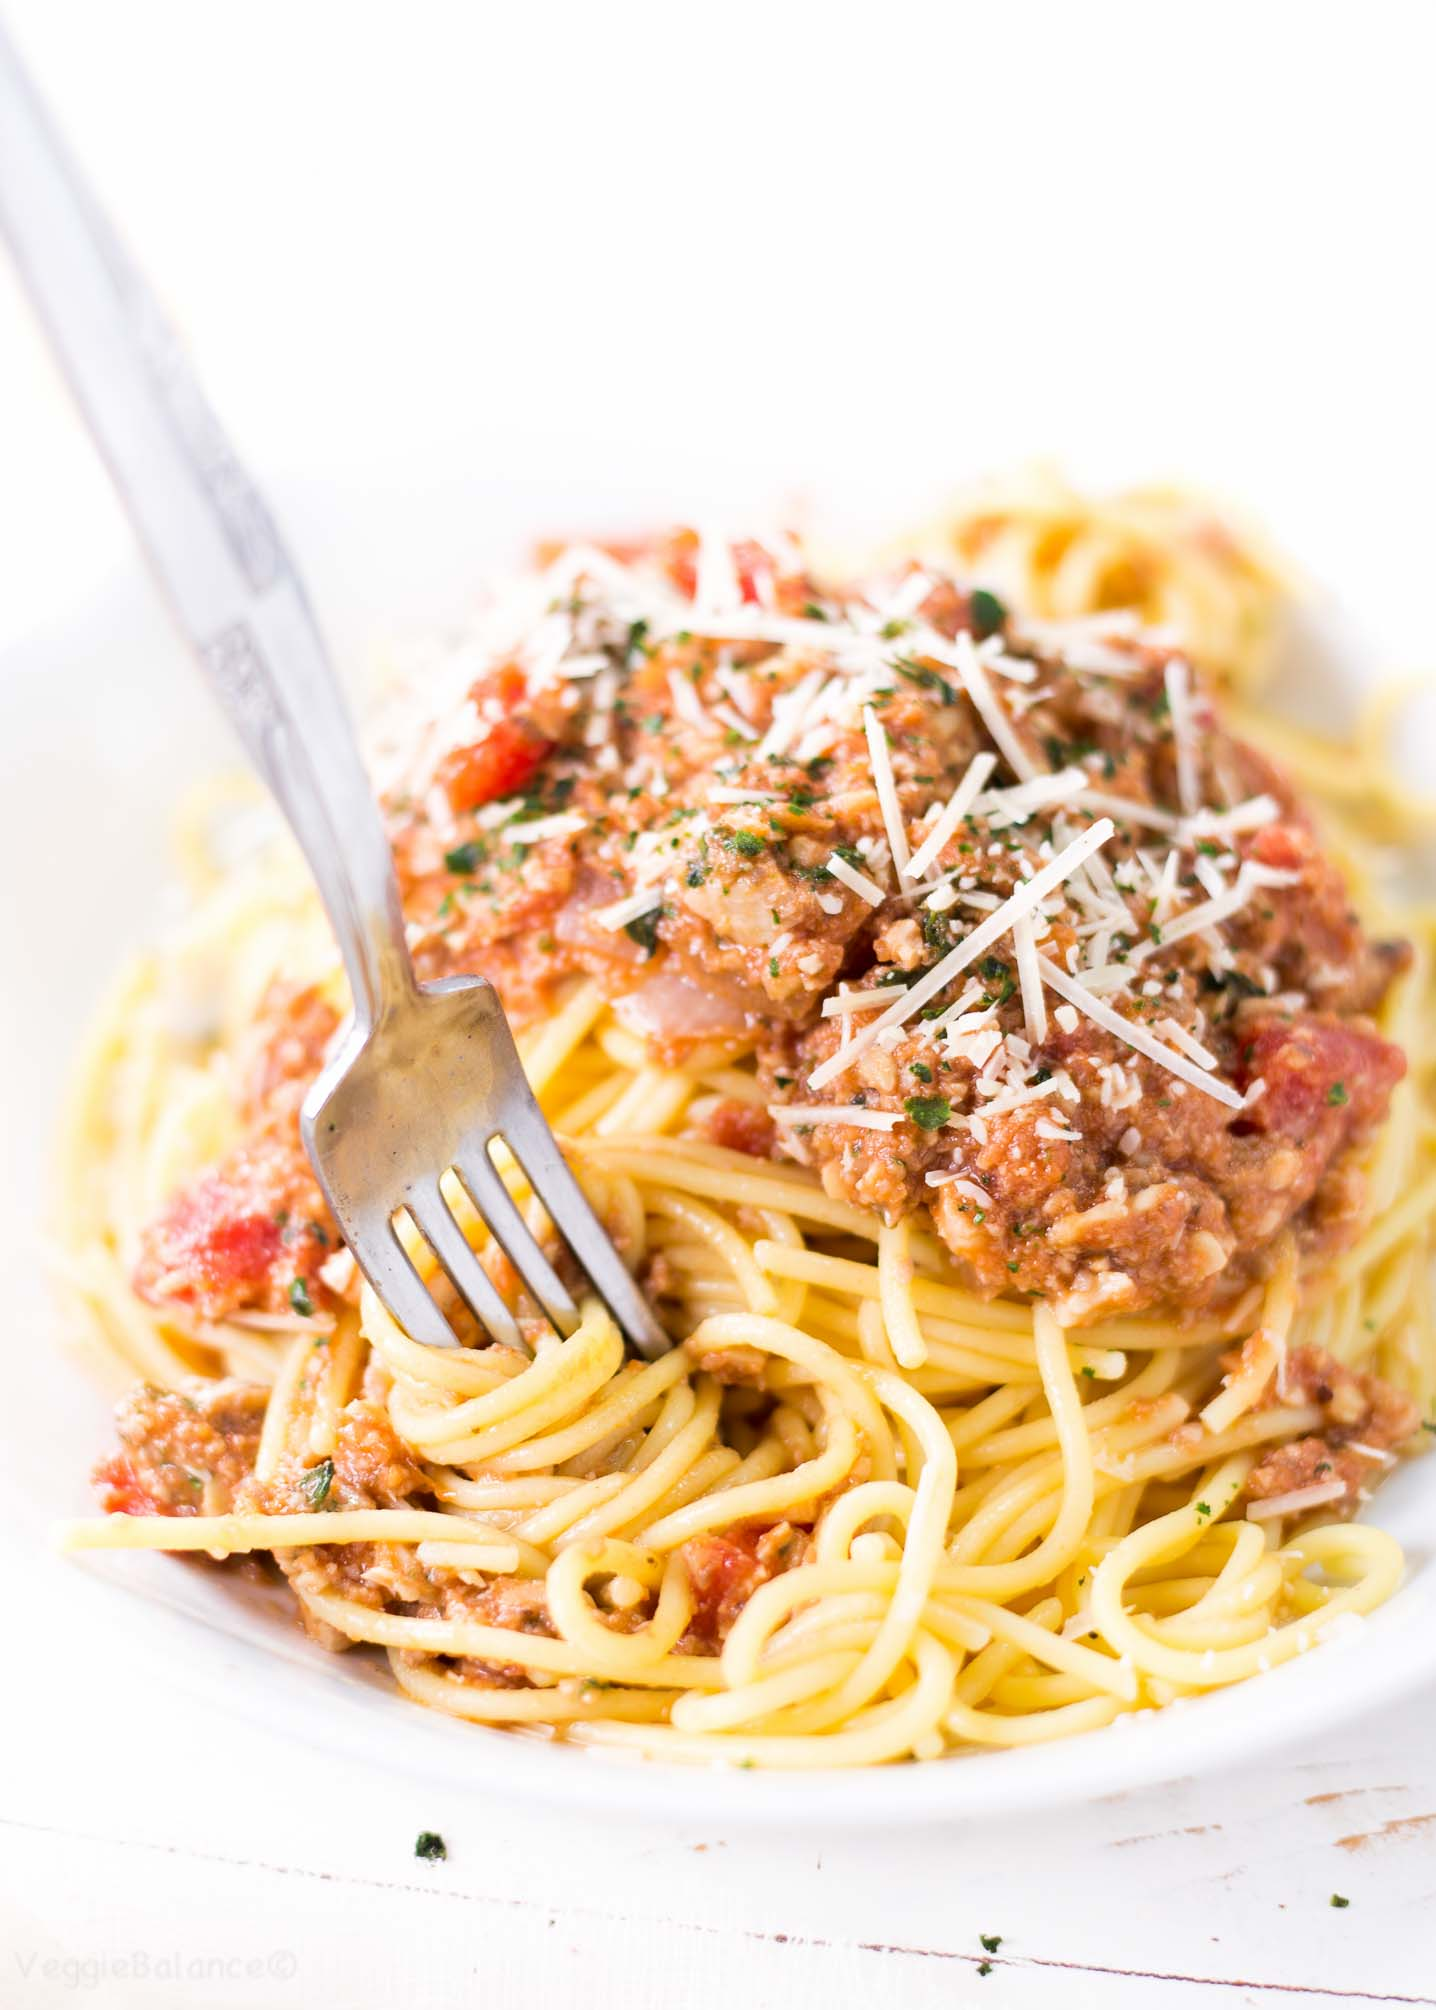 Vegetarian Bolognese Sauce (Vegan Spaghetti Sauce)